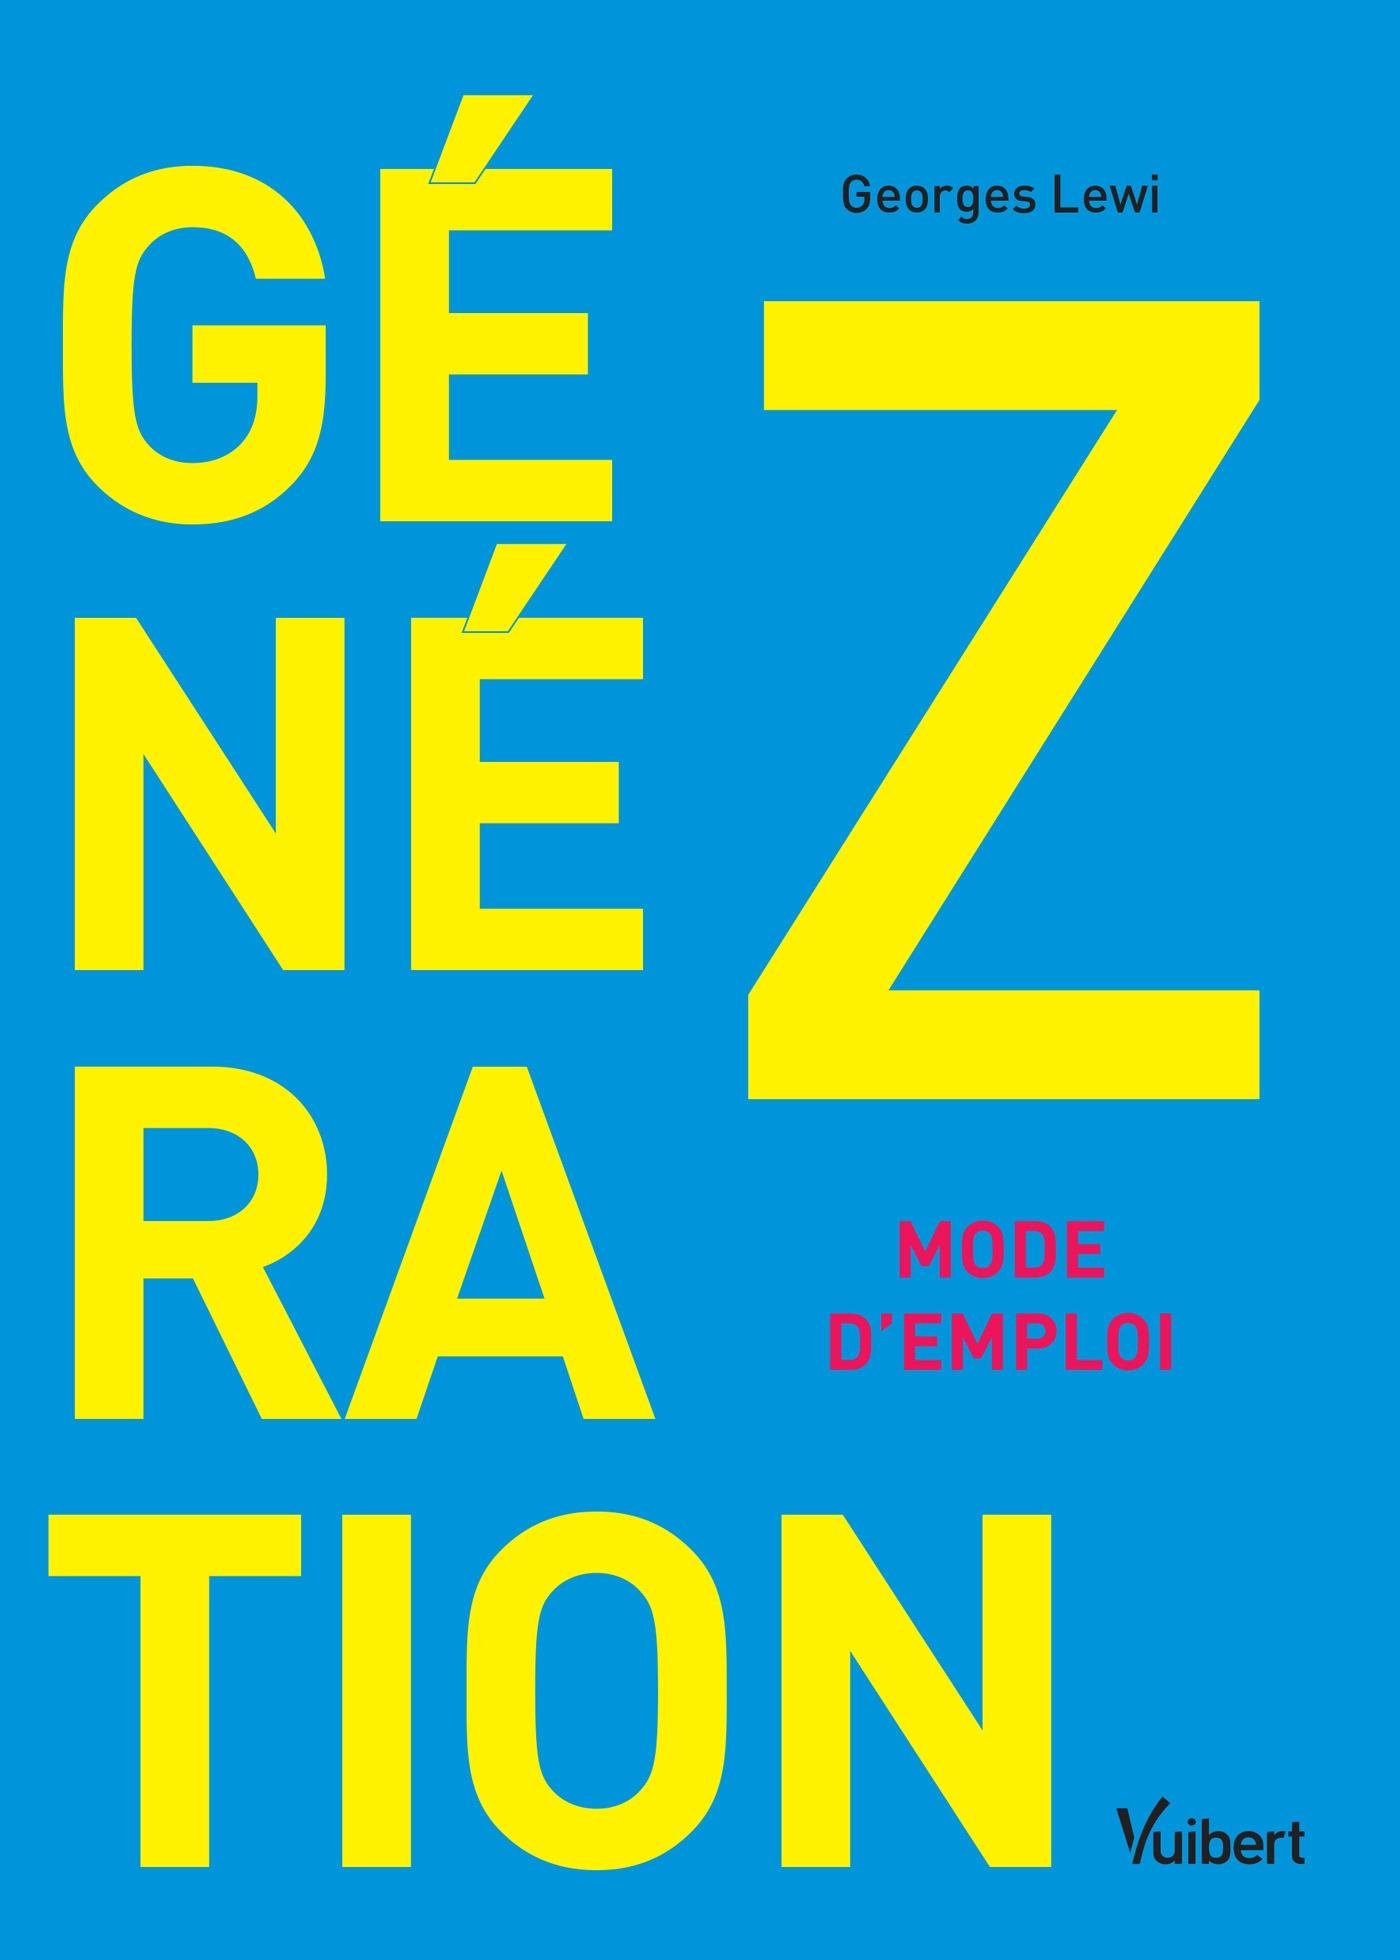 Génération Z : mode d'emploi